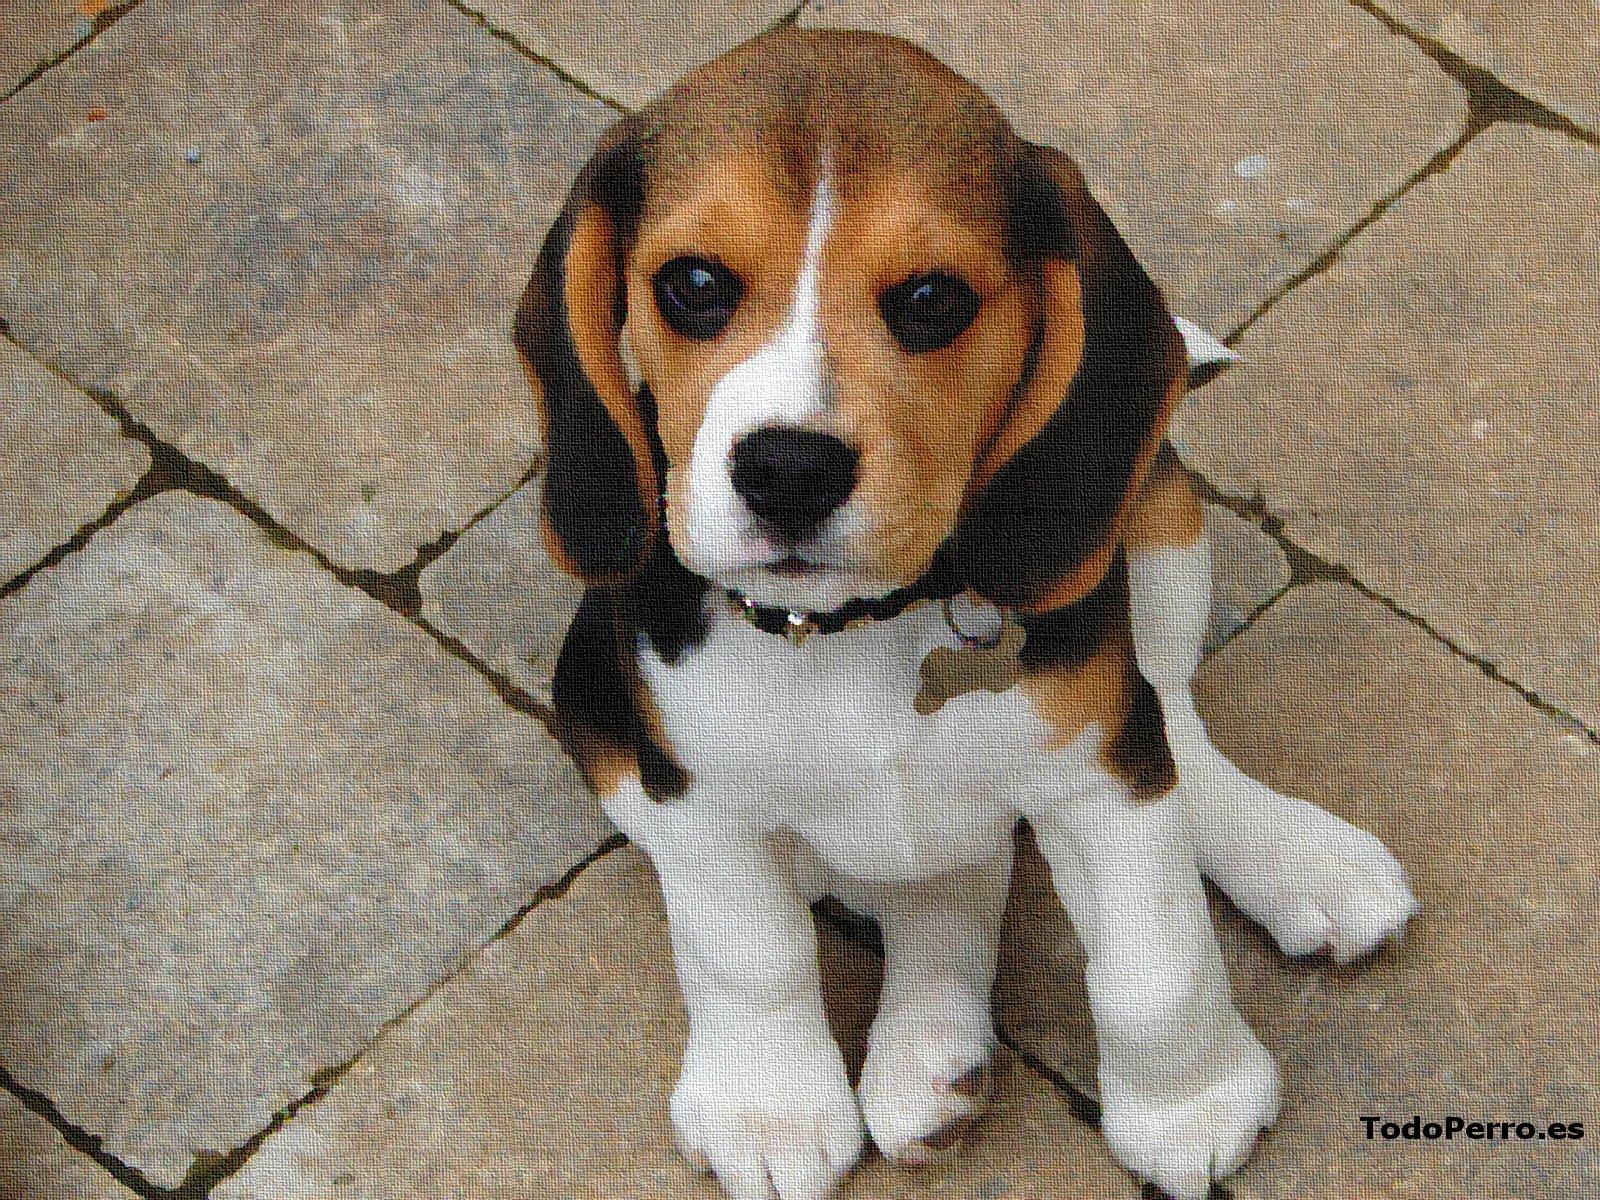 Gallery for nombres de razas de perros peque os y fotos for Comedores pequea os para 4 personas